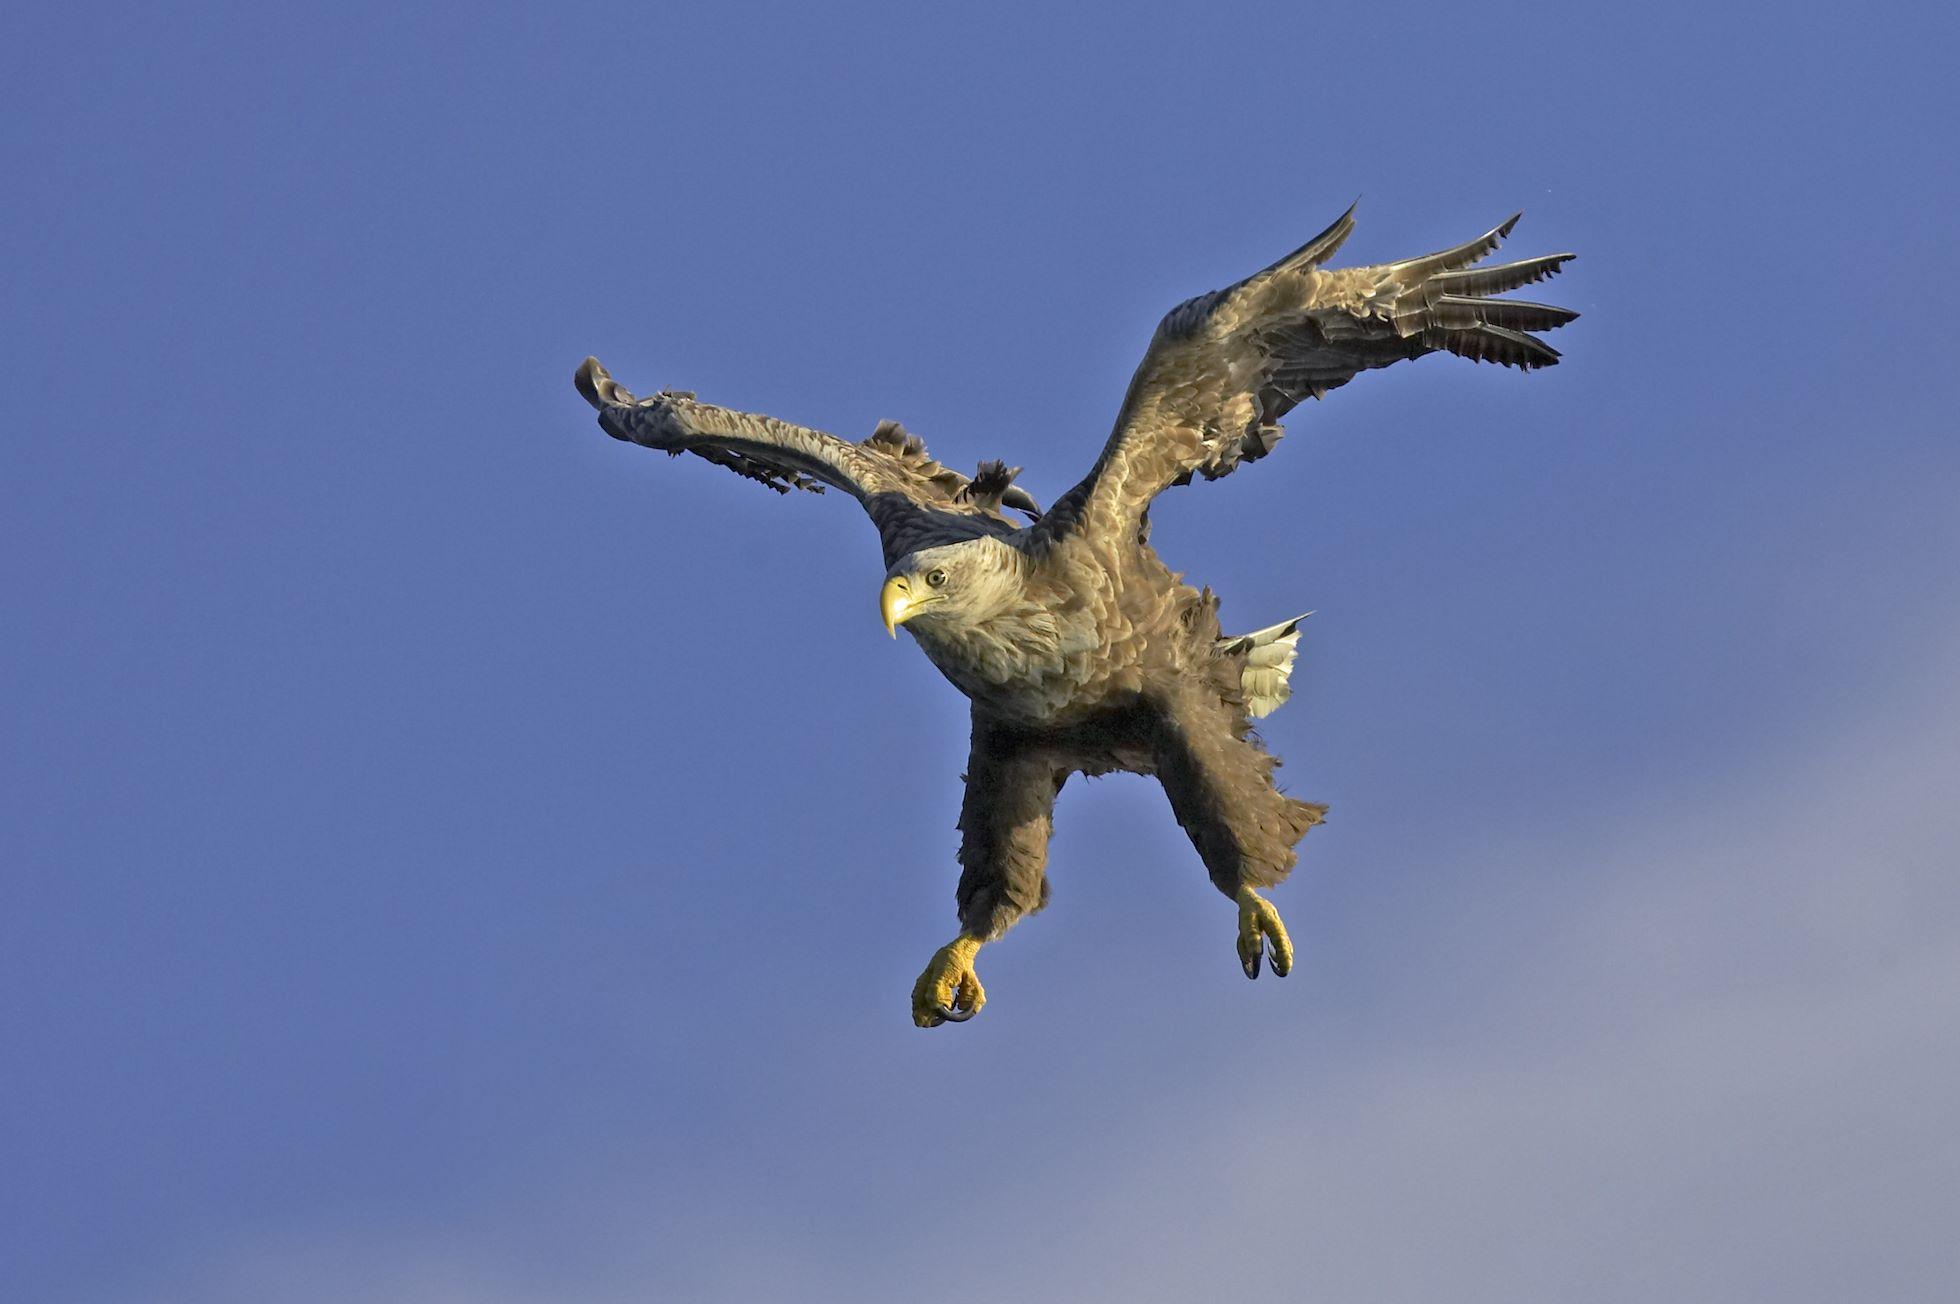 Sea eagle (Haliaeetus albicilla) in flight against blue sky, Flatanger, Norway.